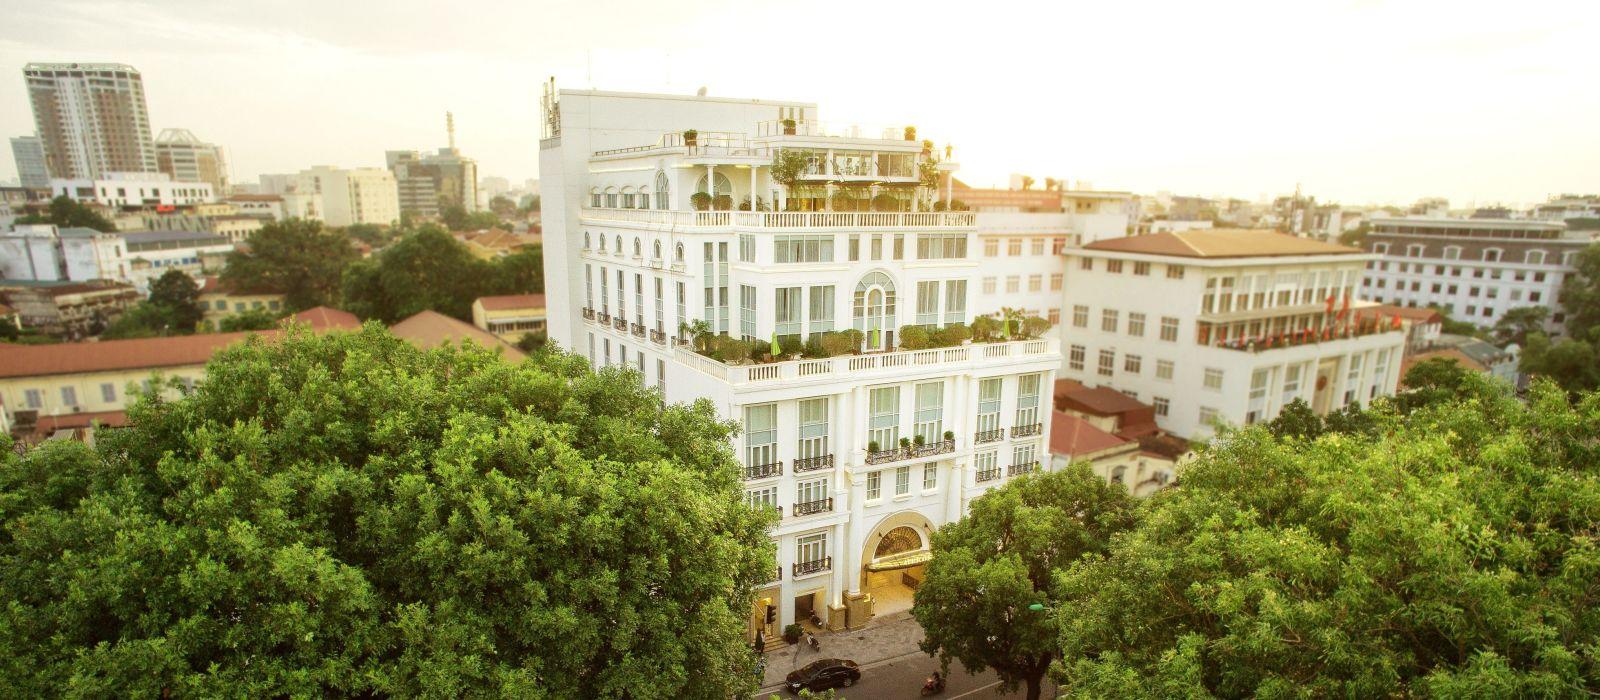 Hotel The Apricot , Hanoi Vietnam